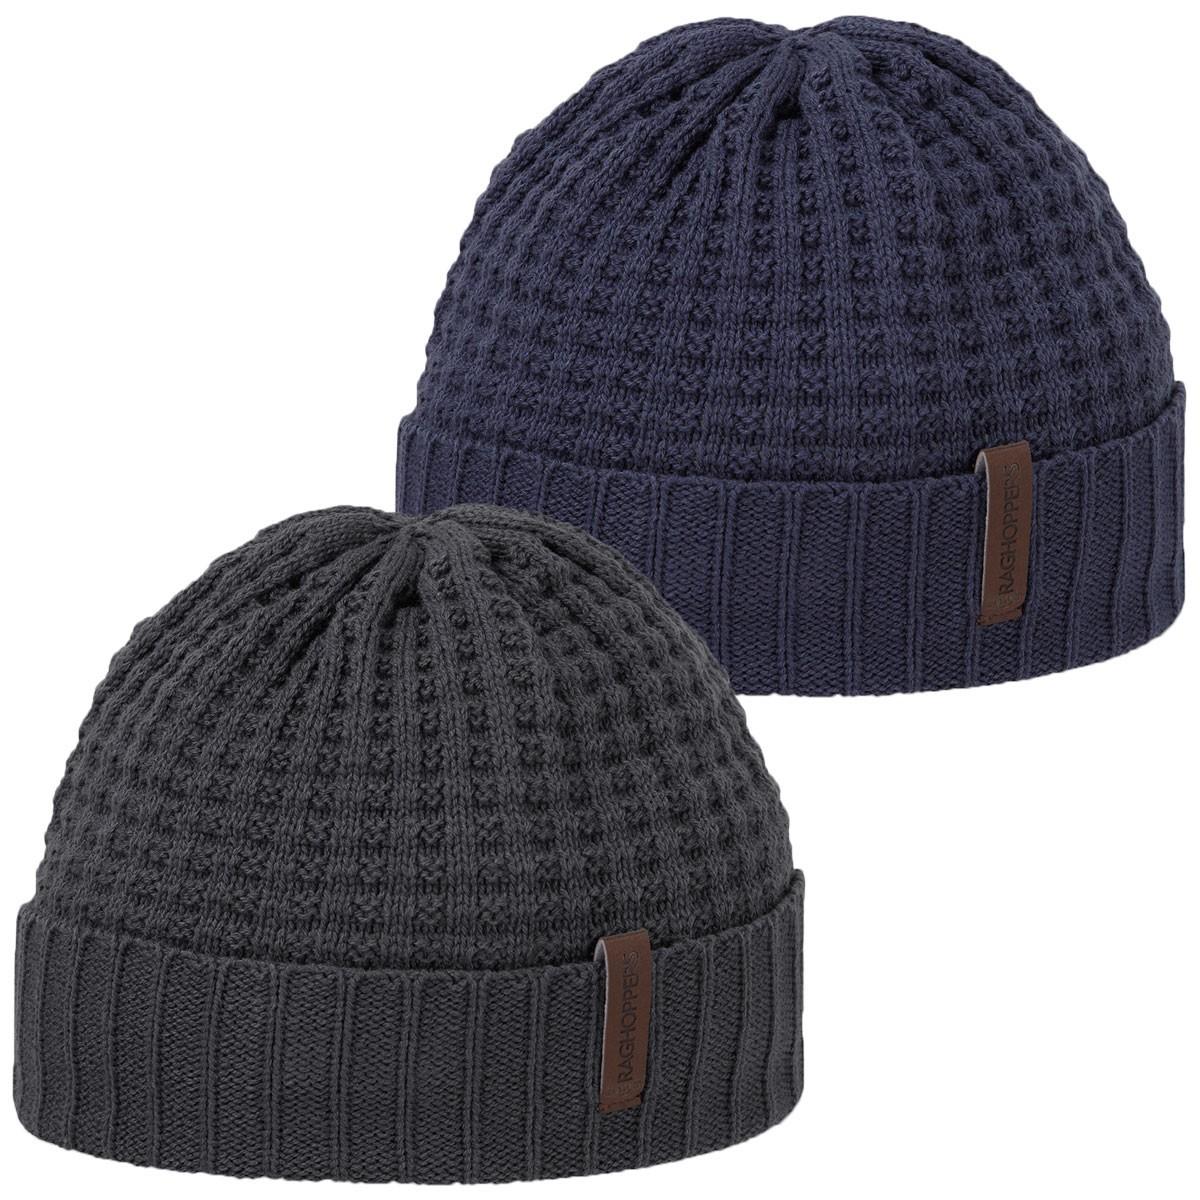 691d5dac6d9 Craghoppers Unisex Brompton Waffle Beanie Hat